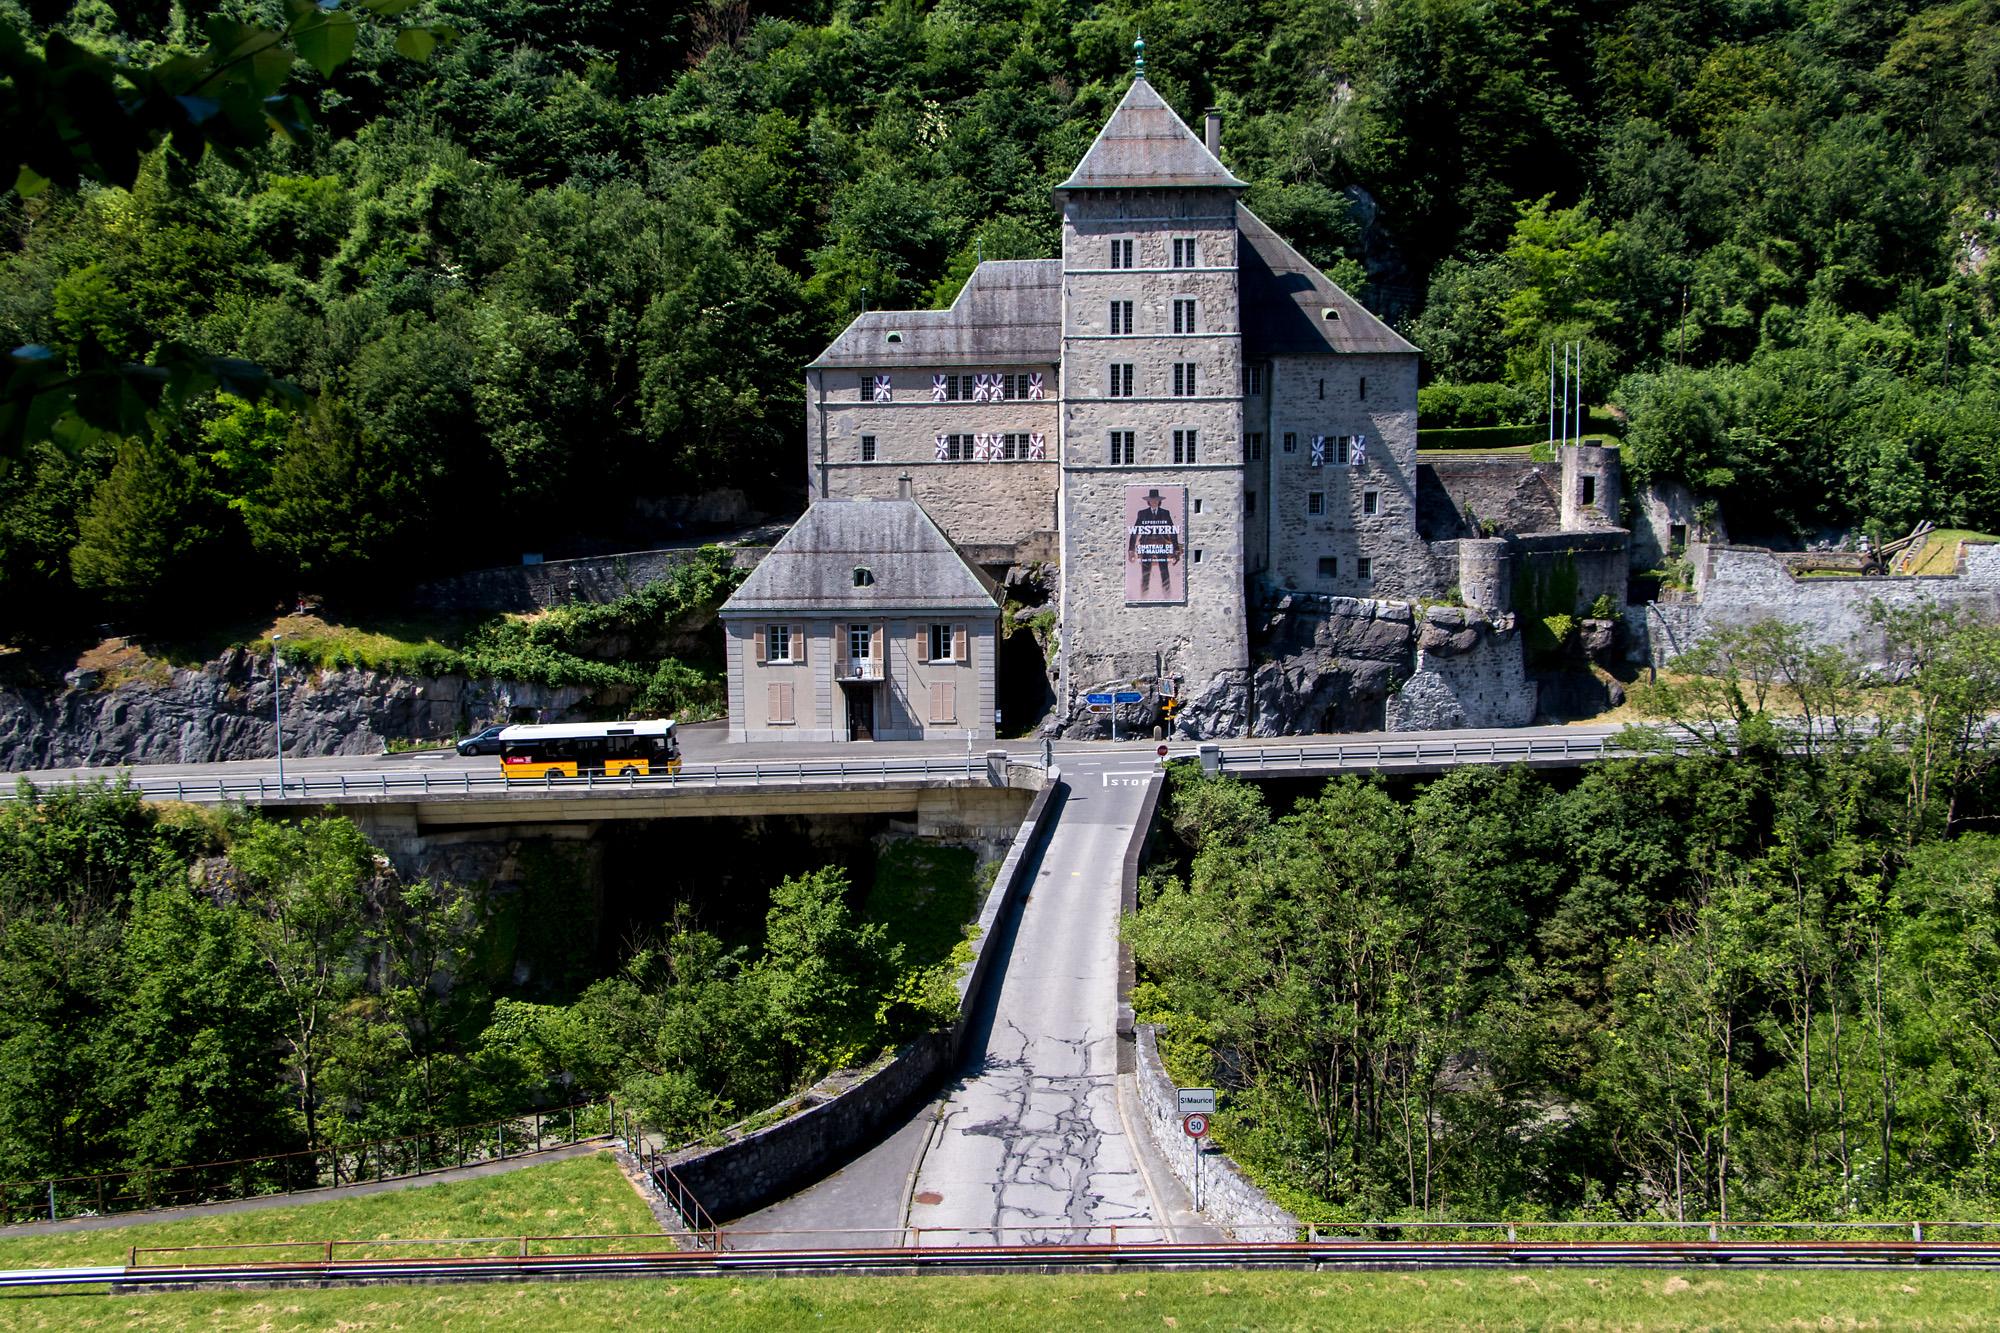 MAN-Midibus vor der imposanten Burg St. Maurice, erbaut Ende des 15. Jh.